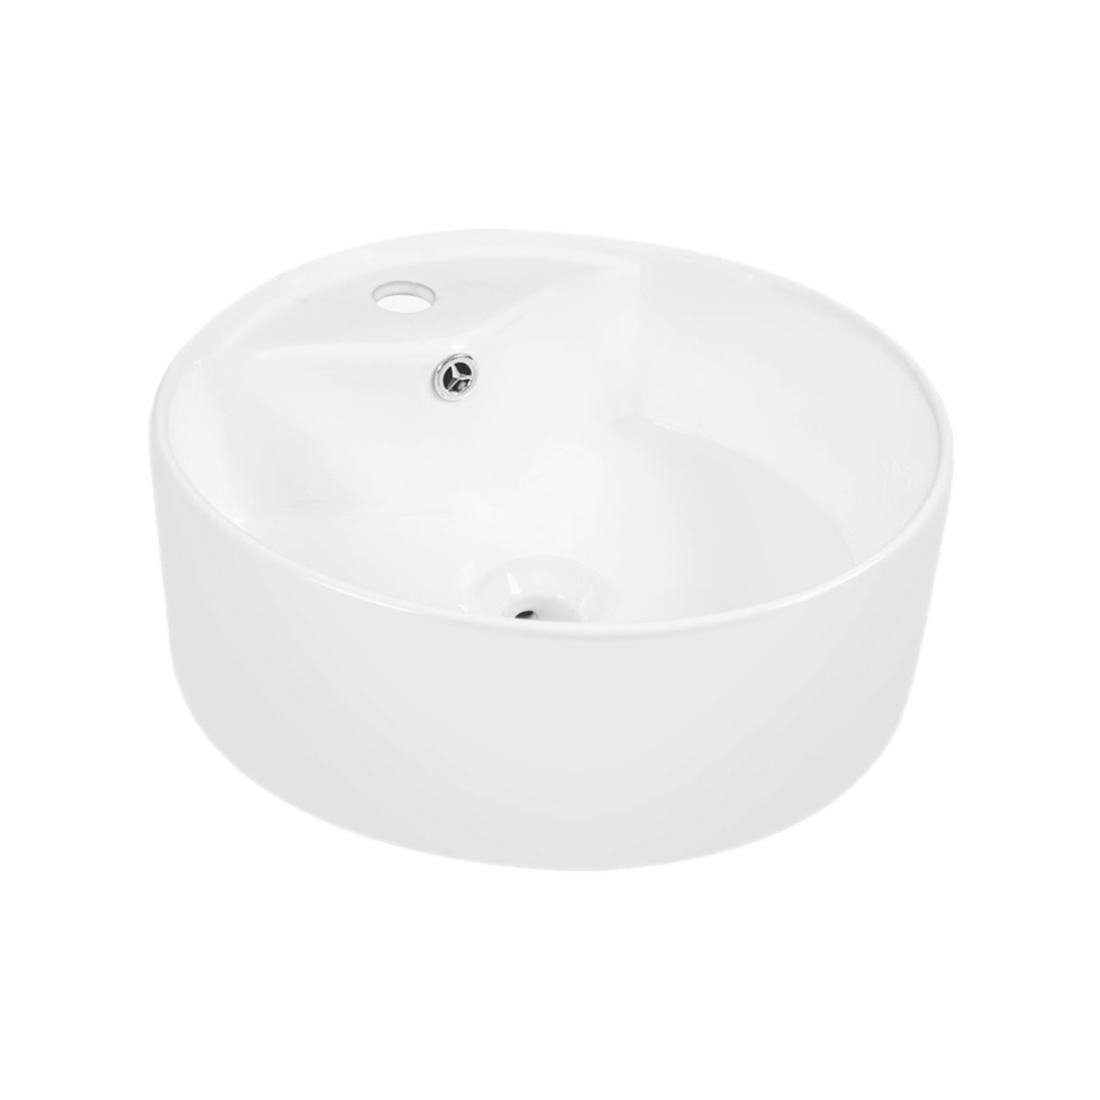 Kerovit Kaspar KB106 Counter Top Wash Basin